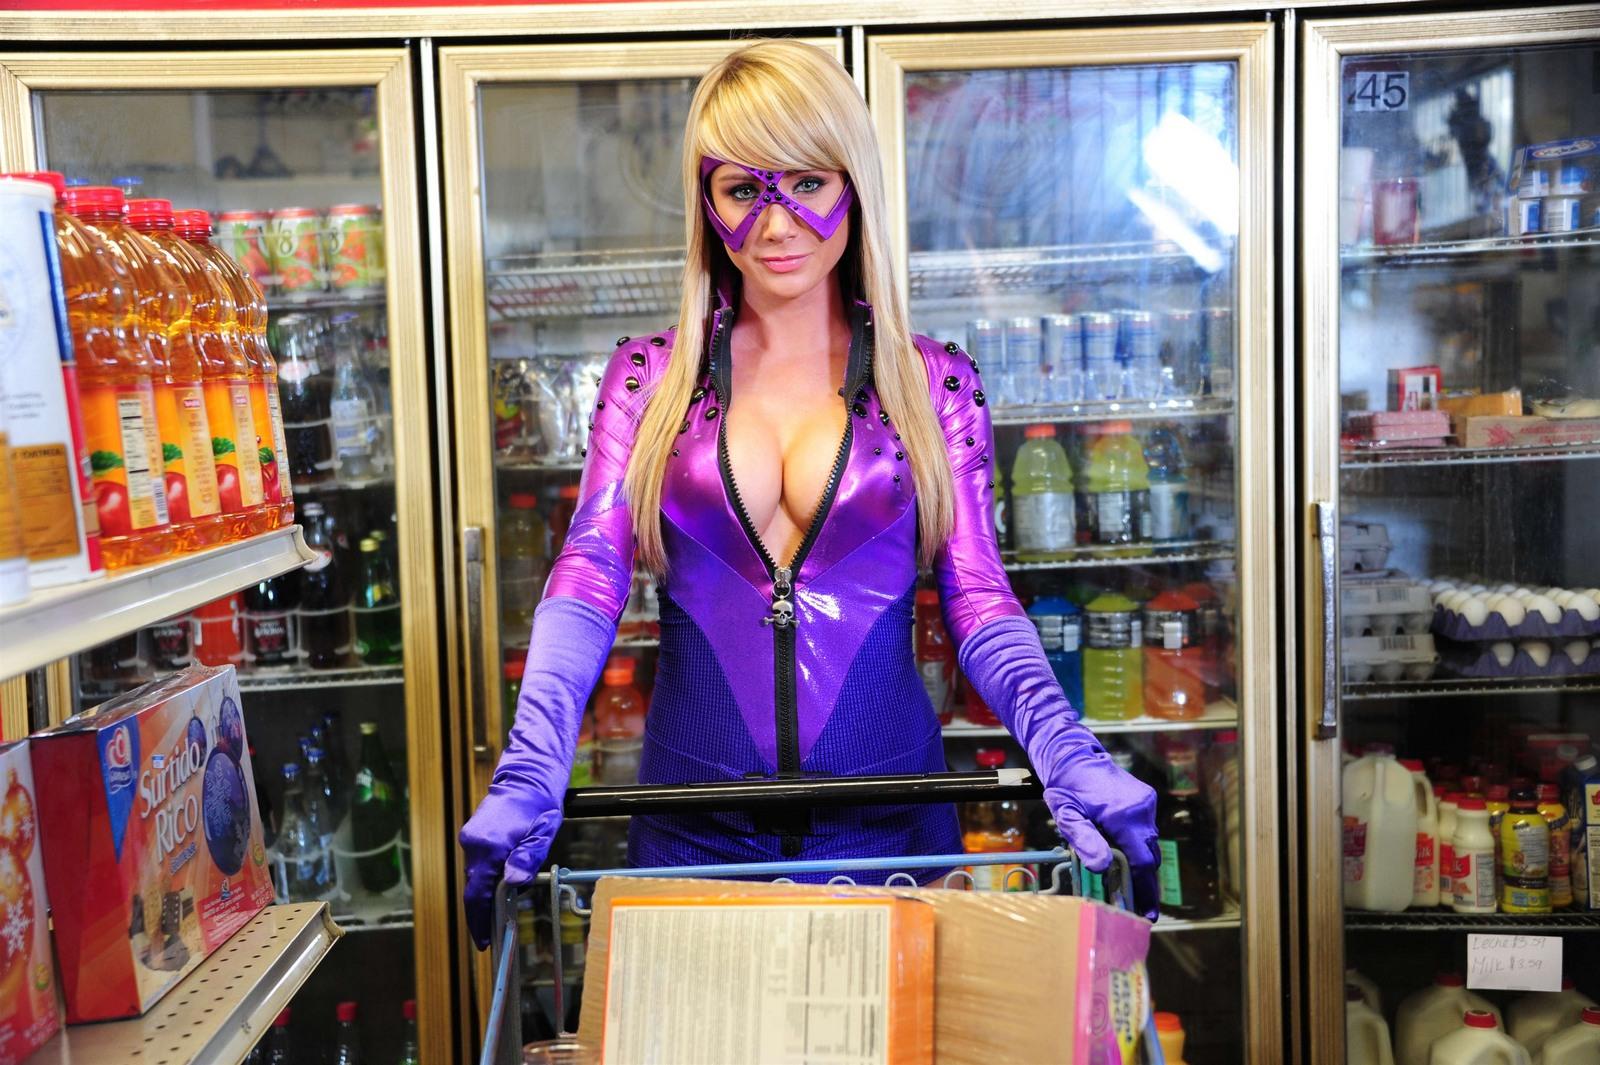 http://3.bp.blogspot.com/-kq0PwqKTdM4/TfMjF5cibzI/AAAAAAAACKs/XMhSi1cSTX0/s1600/hot-girl-cosplay-superhero-05.jpg